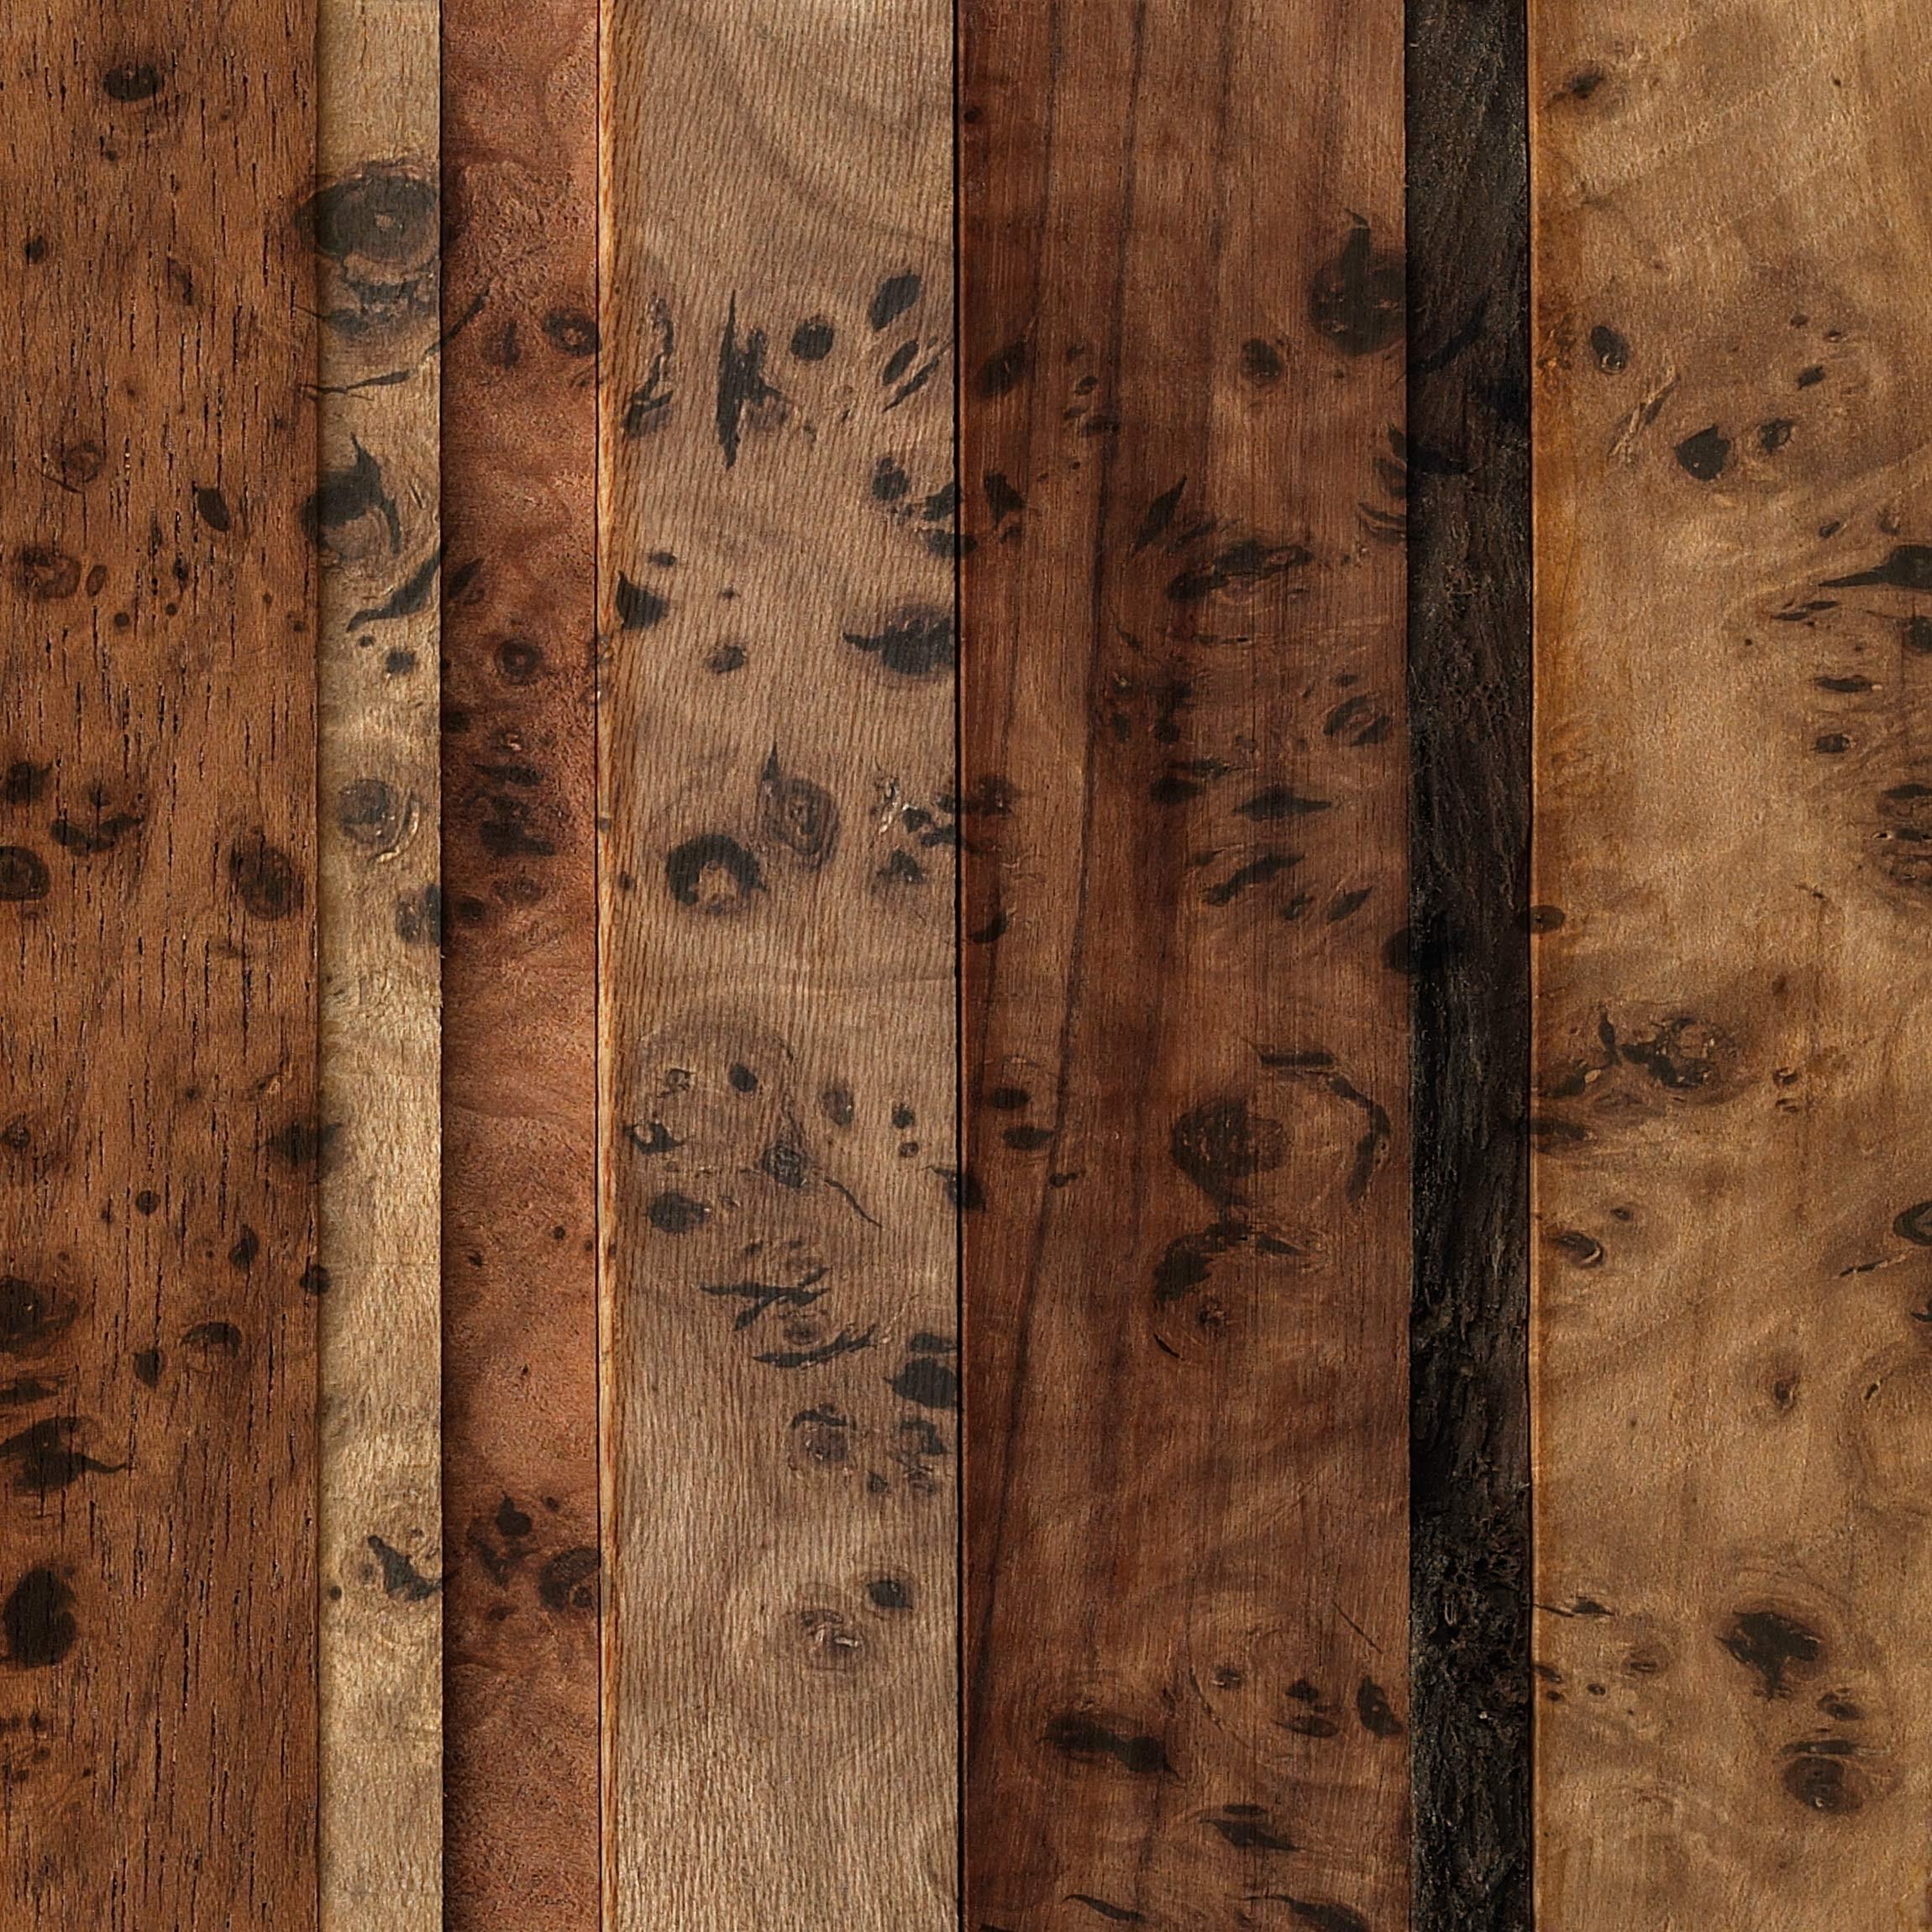 Holzdekorfolie holzwand bird klebefolie holzoptik for Folie holzoptik